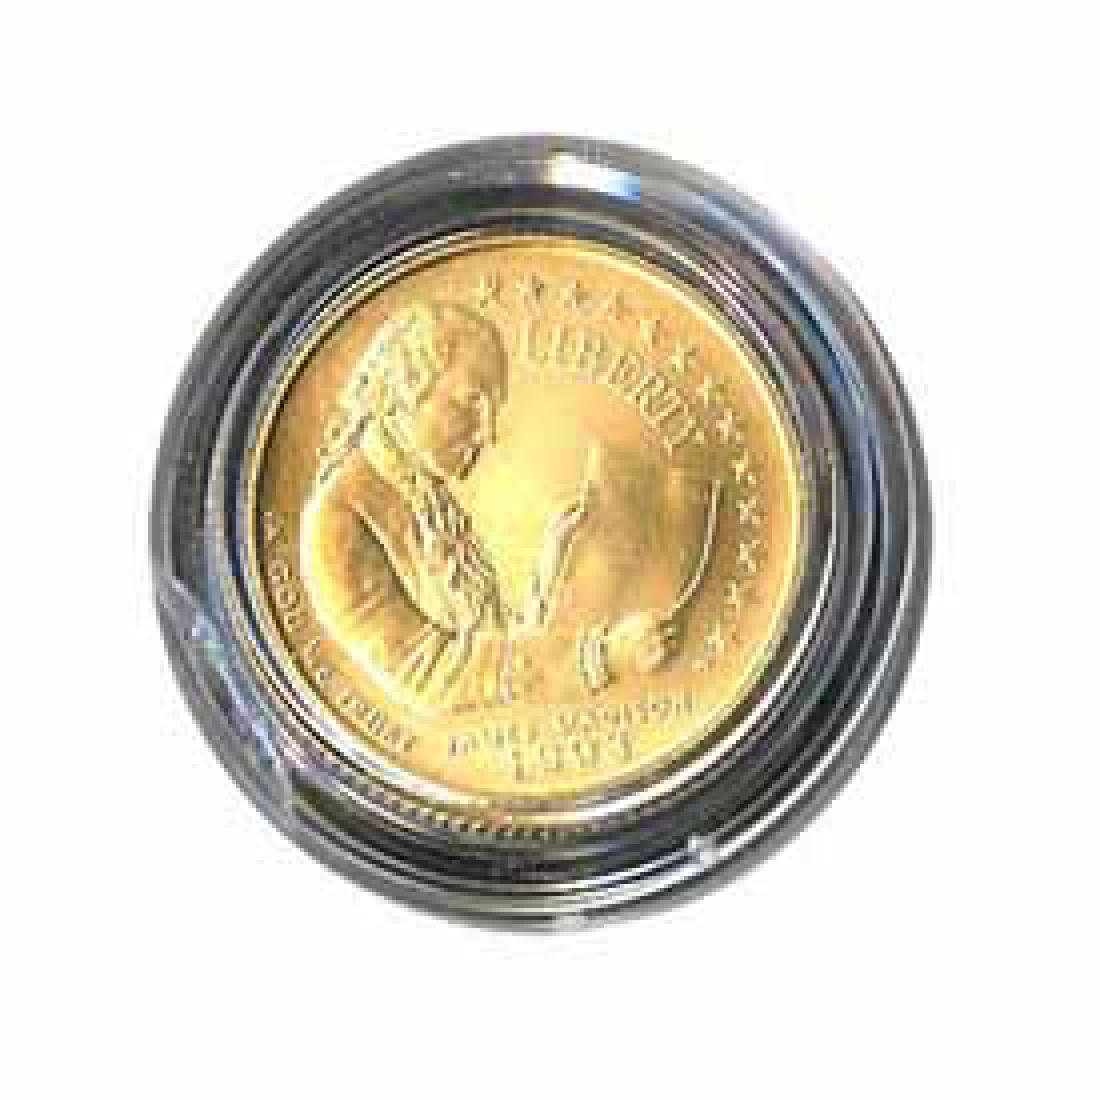 Gold $5 Commemorative 1993 Bill Of Rights BU